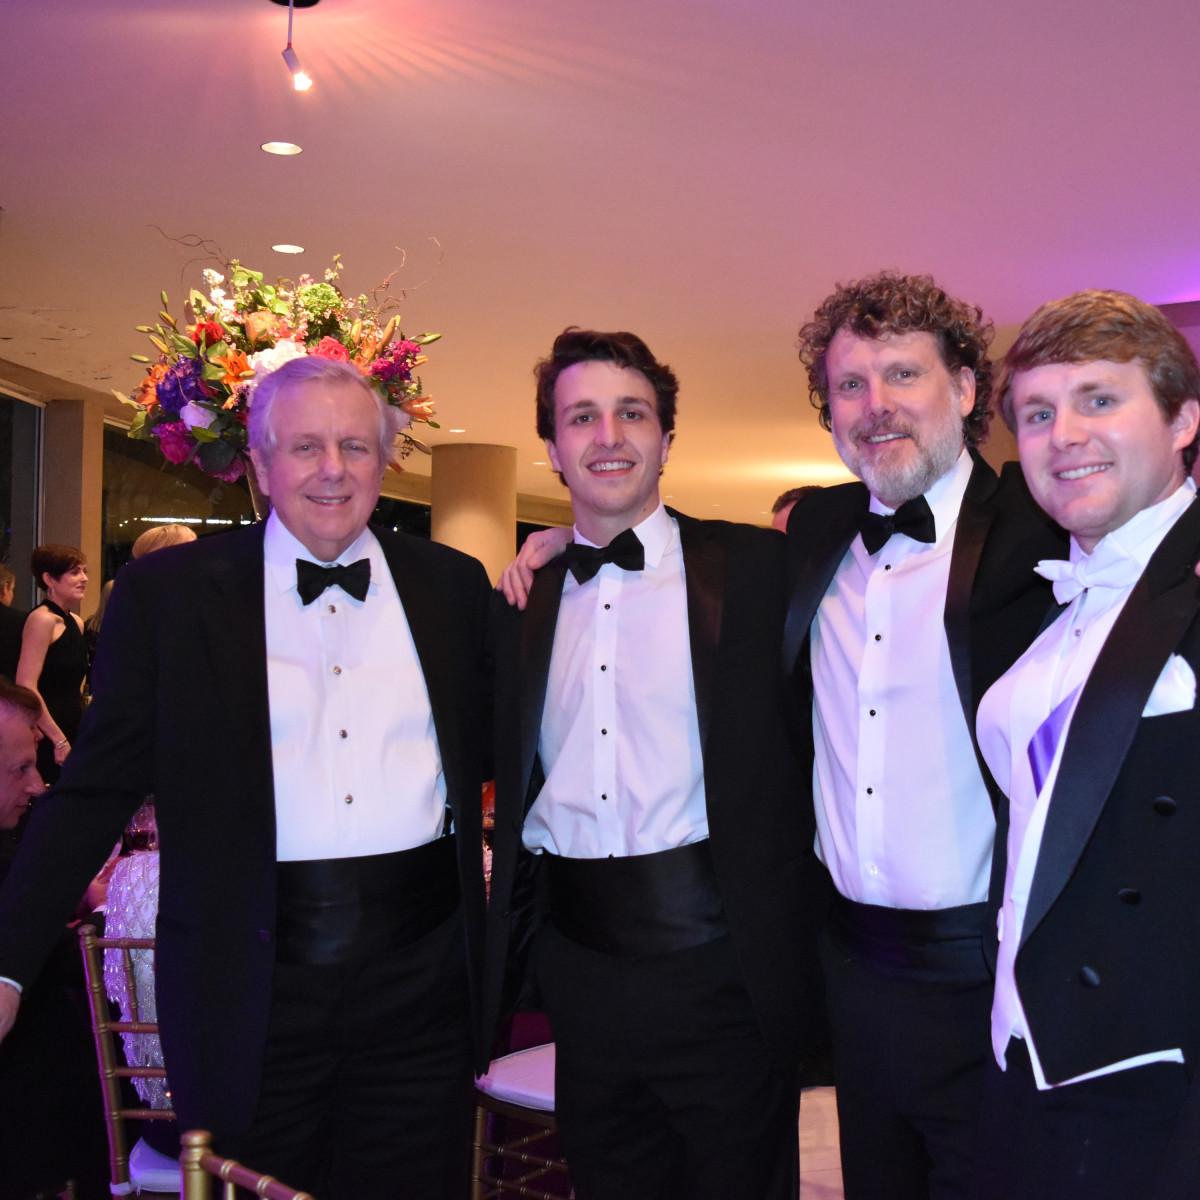 Michael McCullough Sr., Cy McCullough, Michael McCullough Jr., Mac McCullough